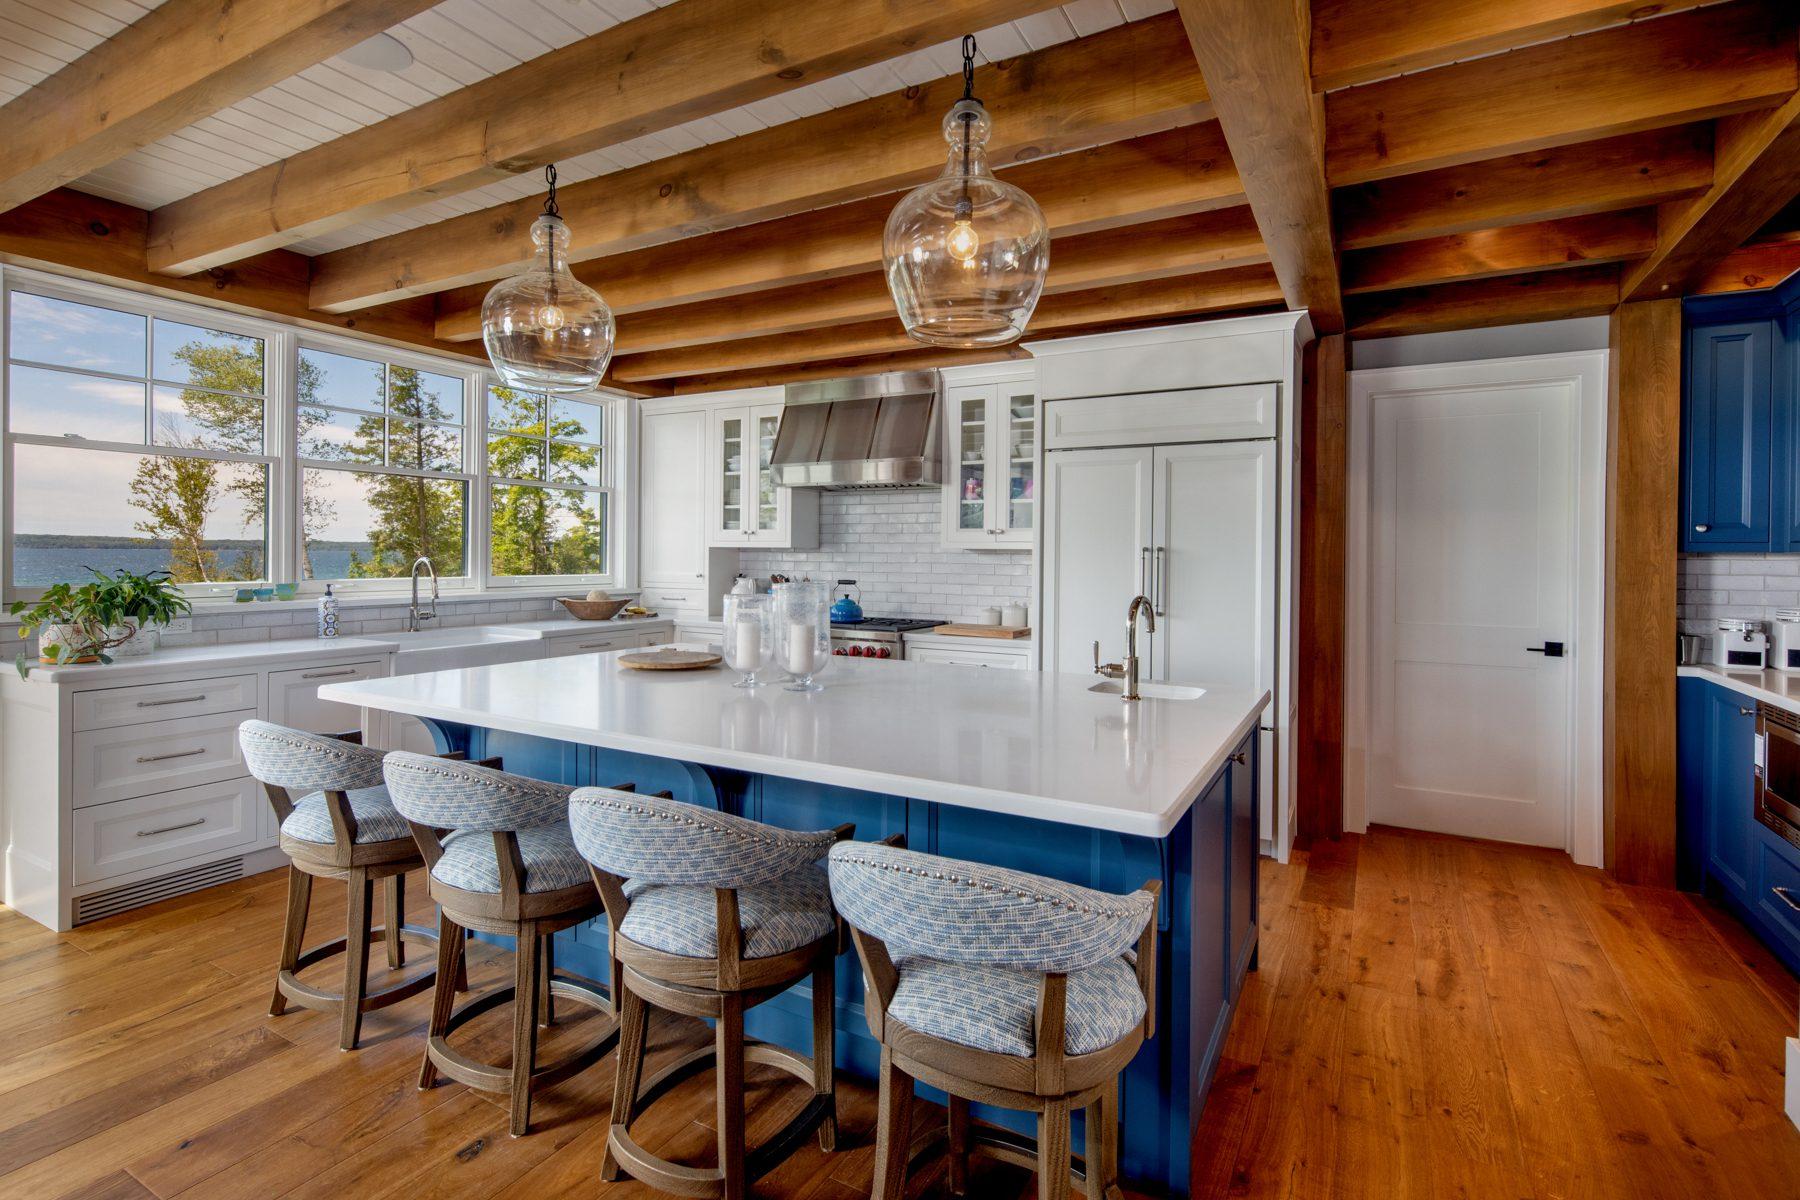 Normerica-Timber-Homes-Timber-Frame-Portfolio-Beachside-Bliss-Interior-Kitchen